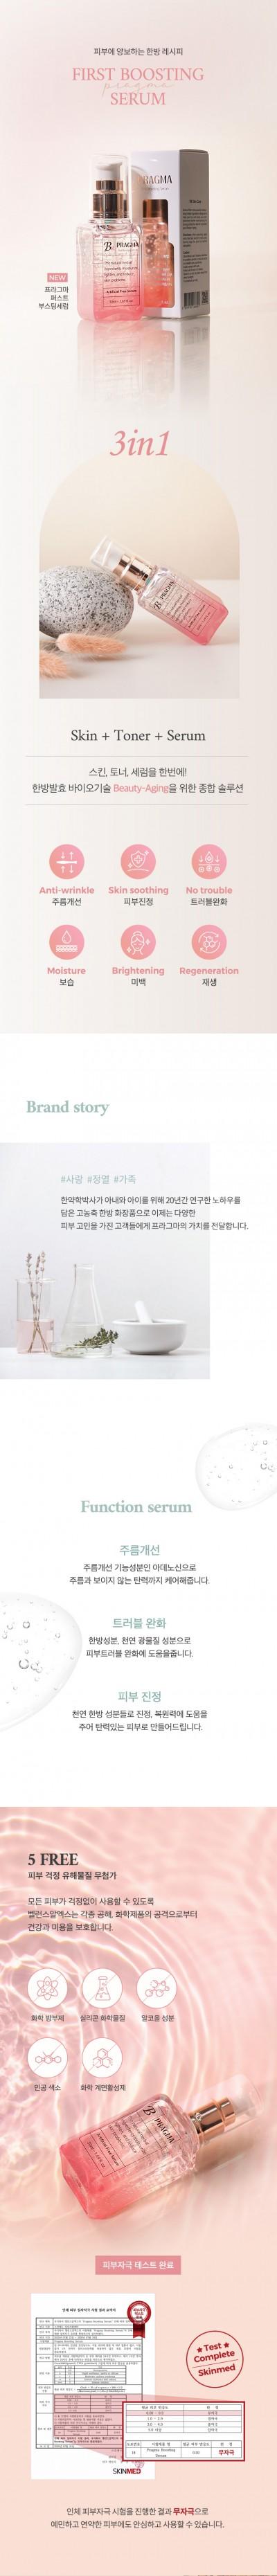 [D185]화장품 상세페이지 제작+촬영